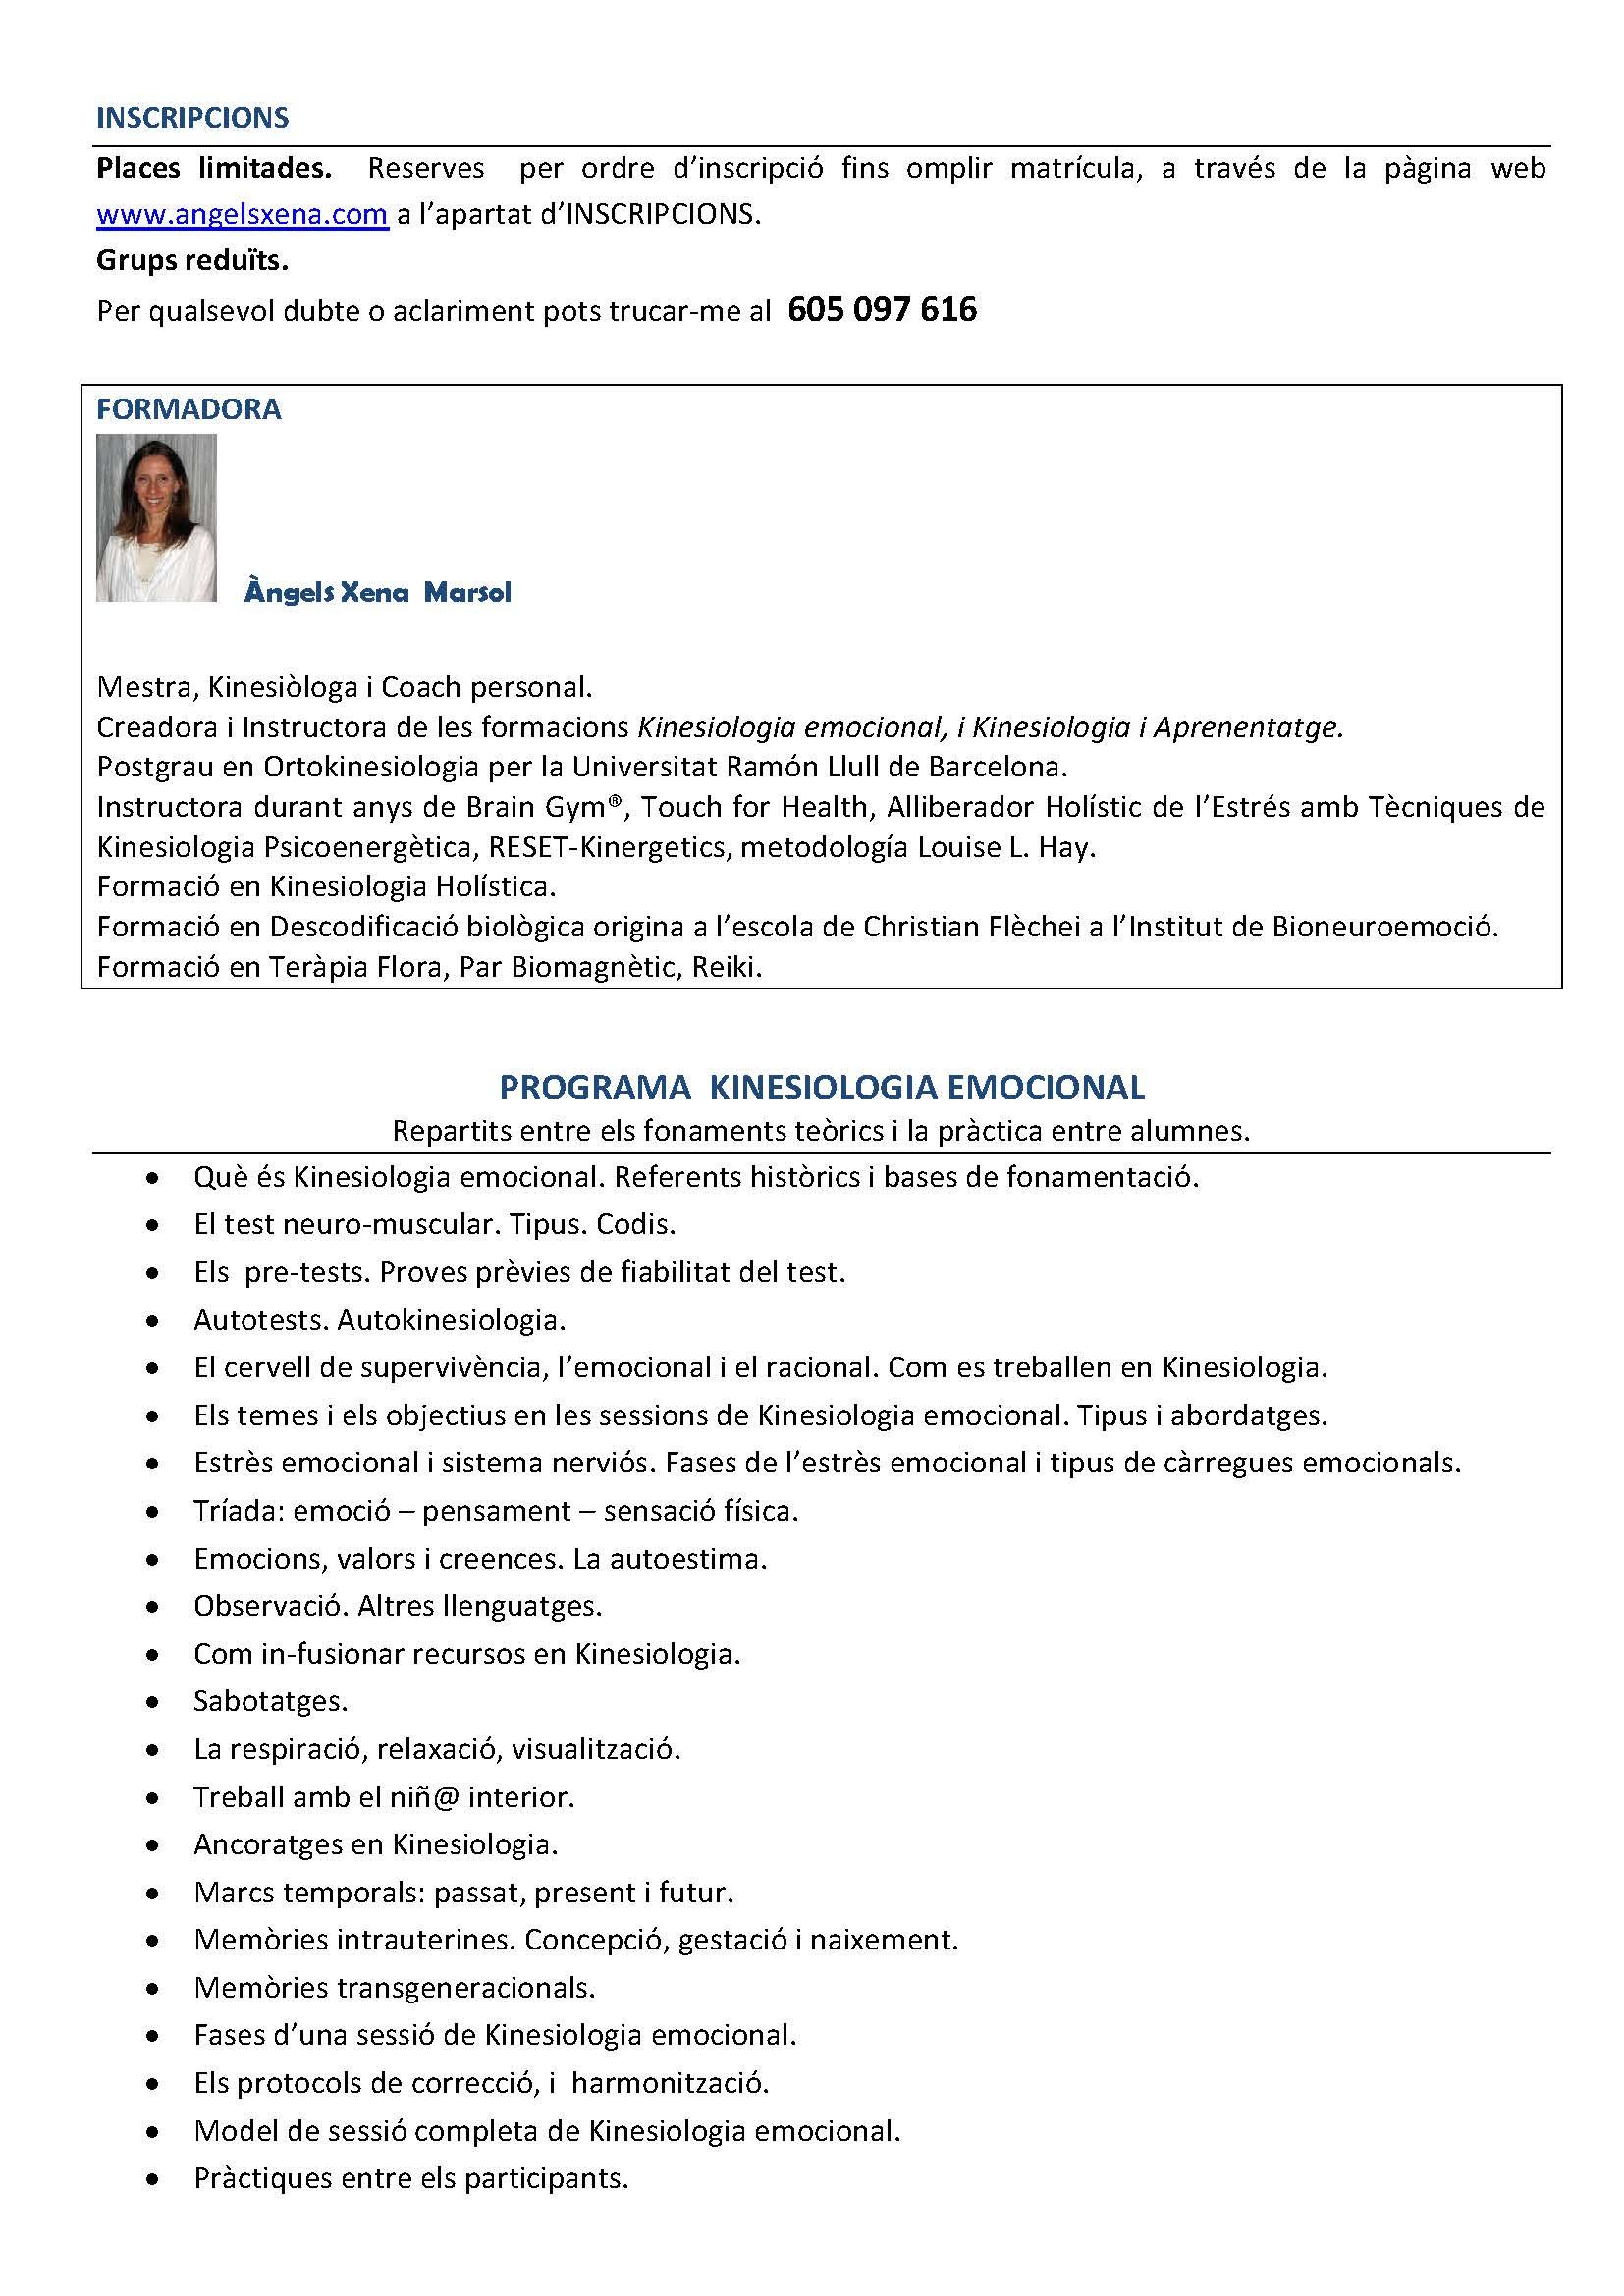 Formació Kinesiologia emocional 2017-18 Mataró_Page_2